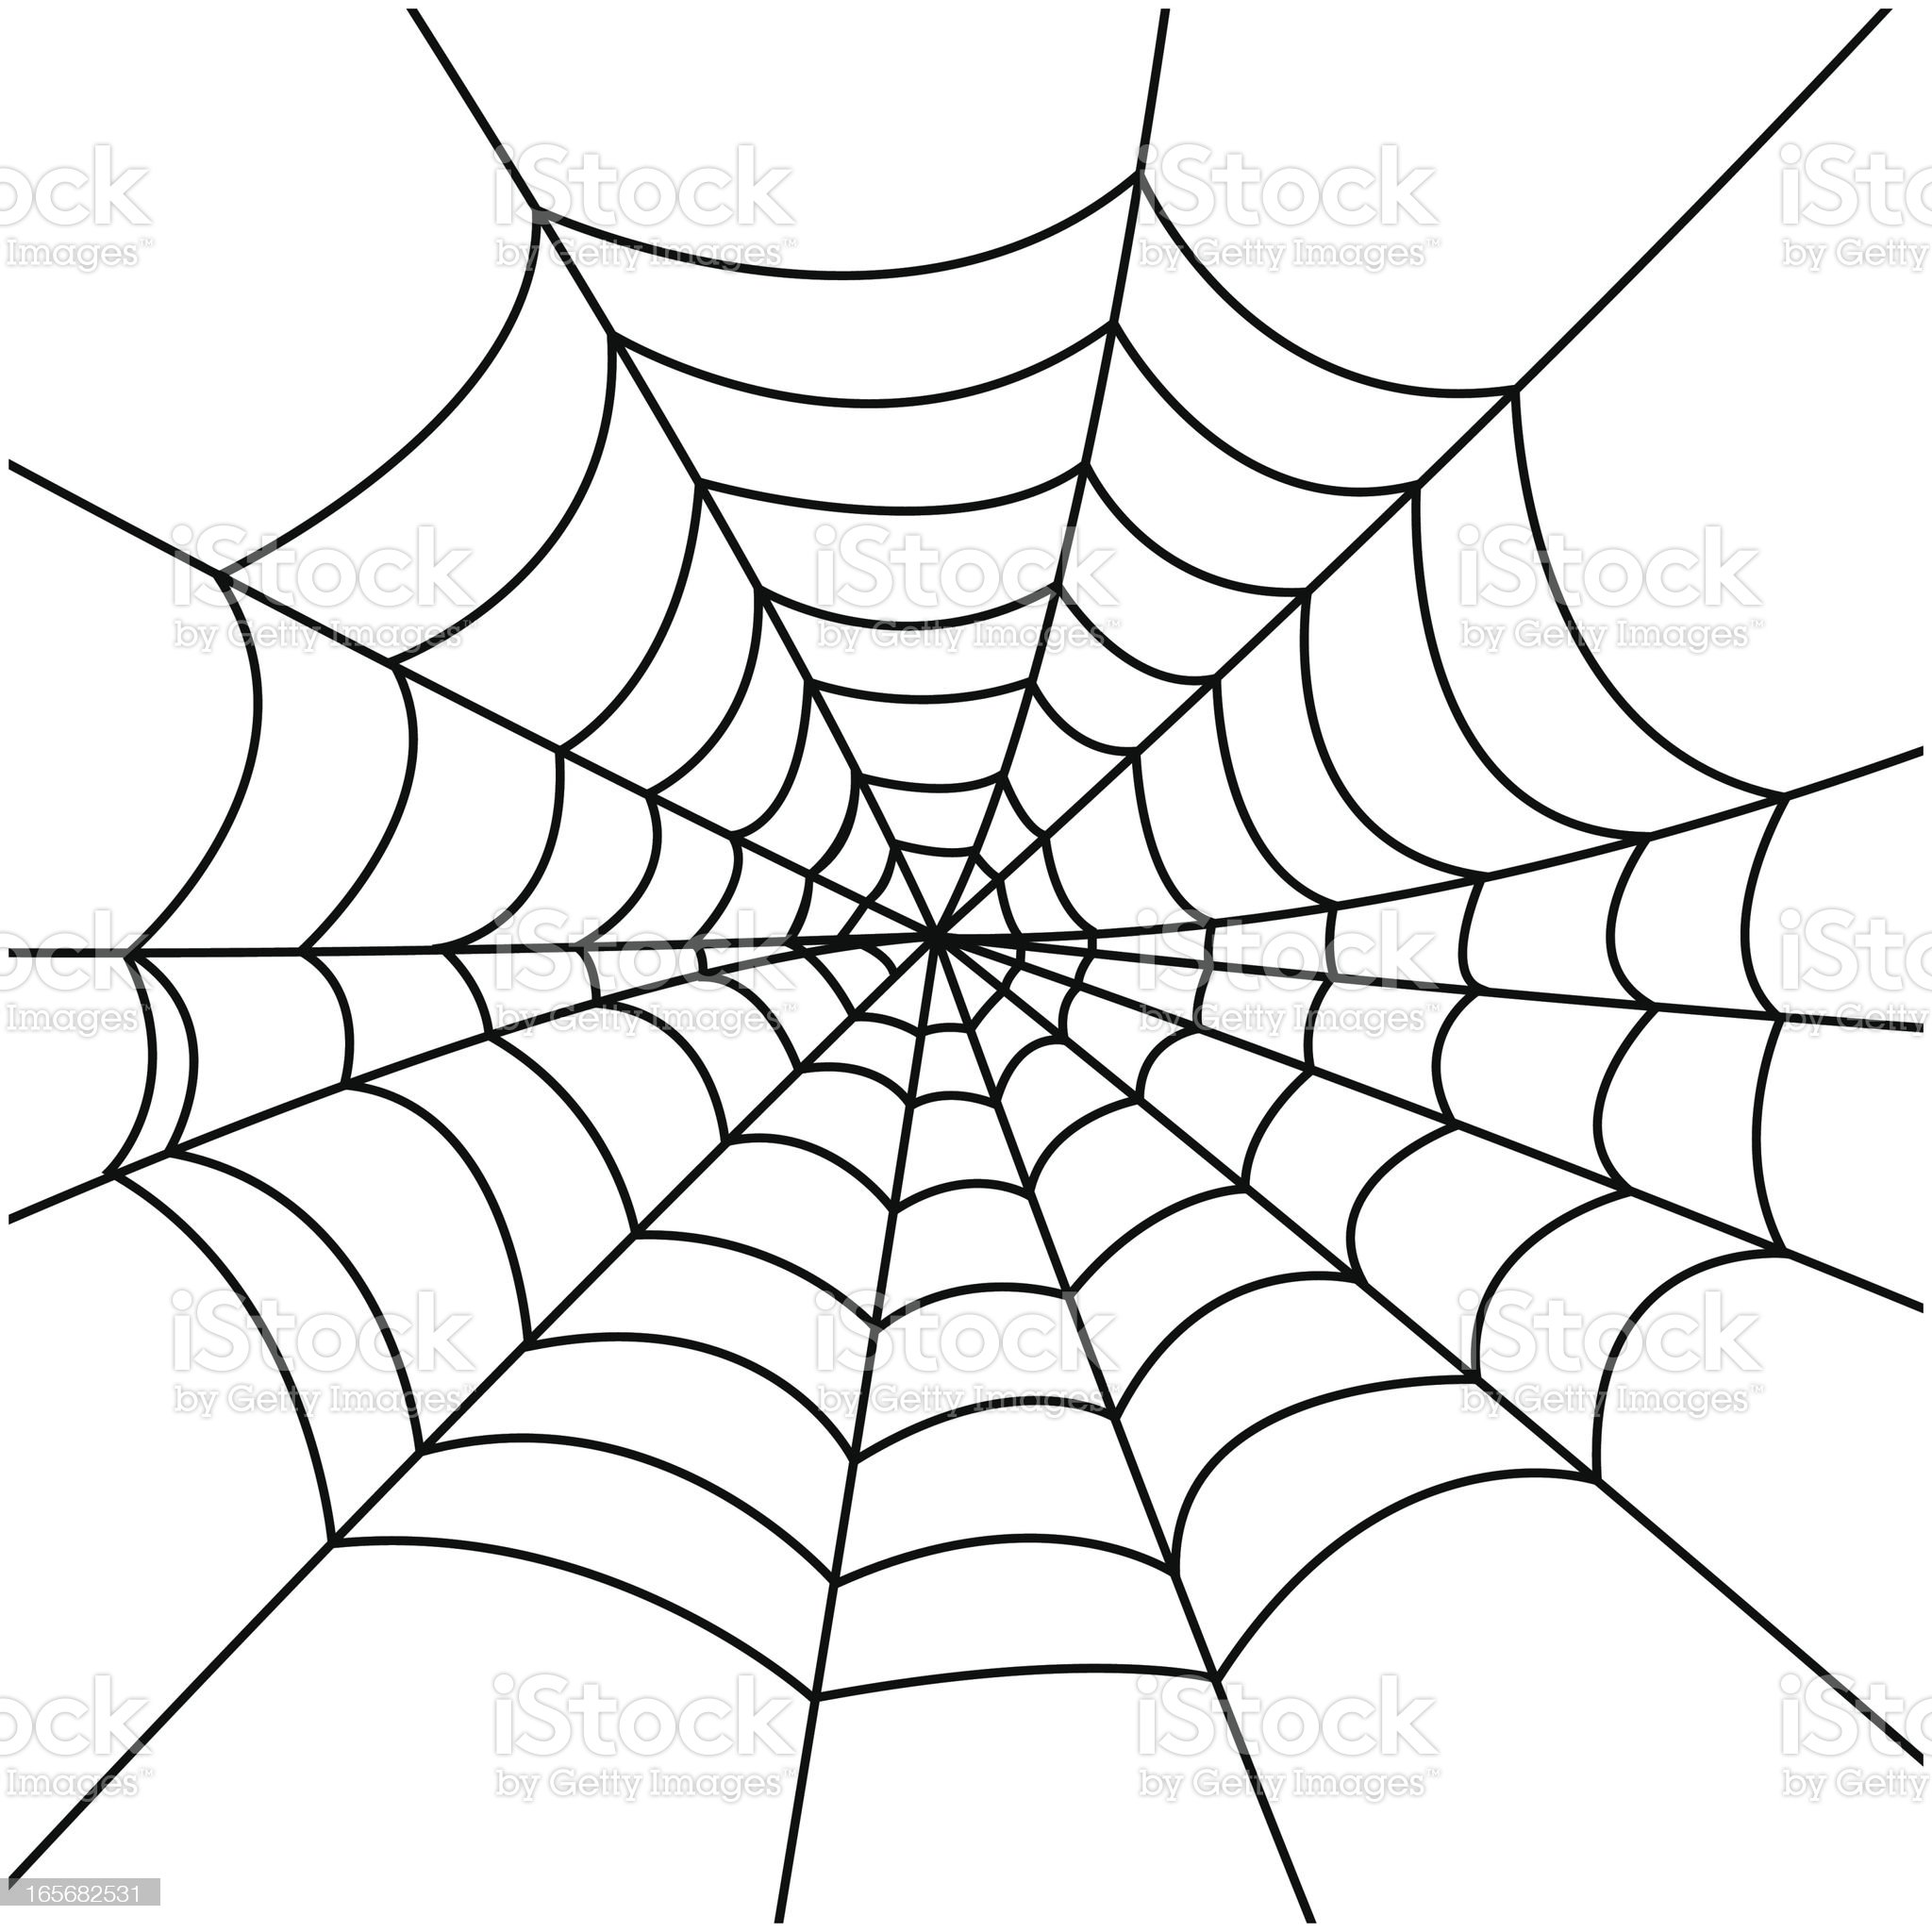 Spider Web royalty-free stock vector art